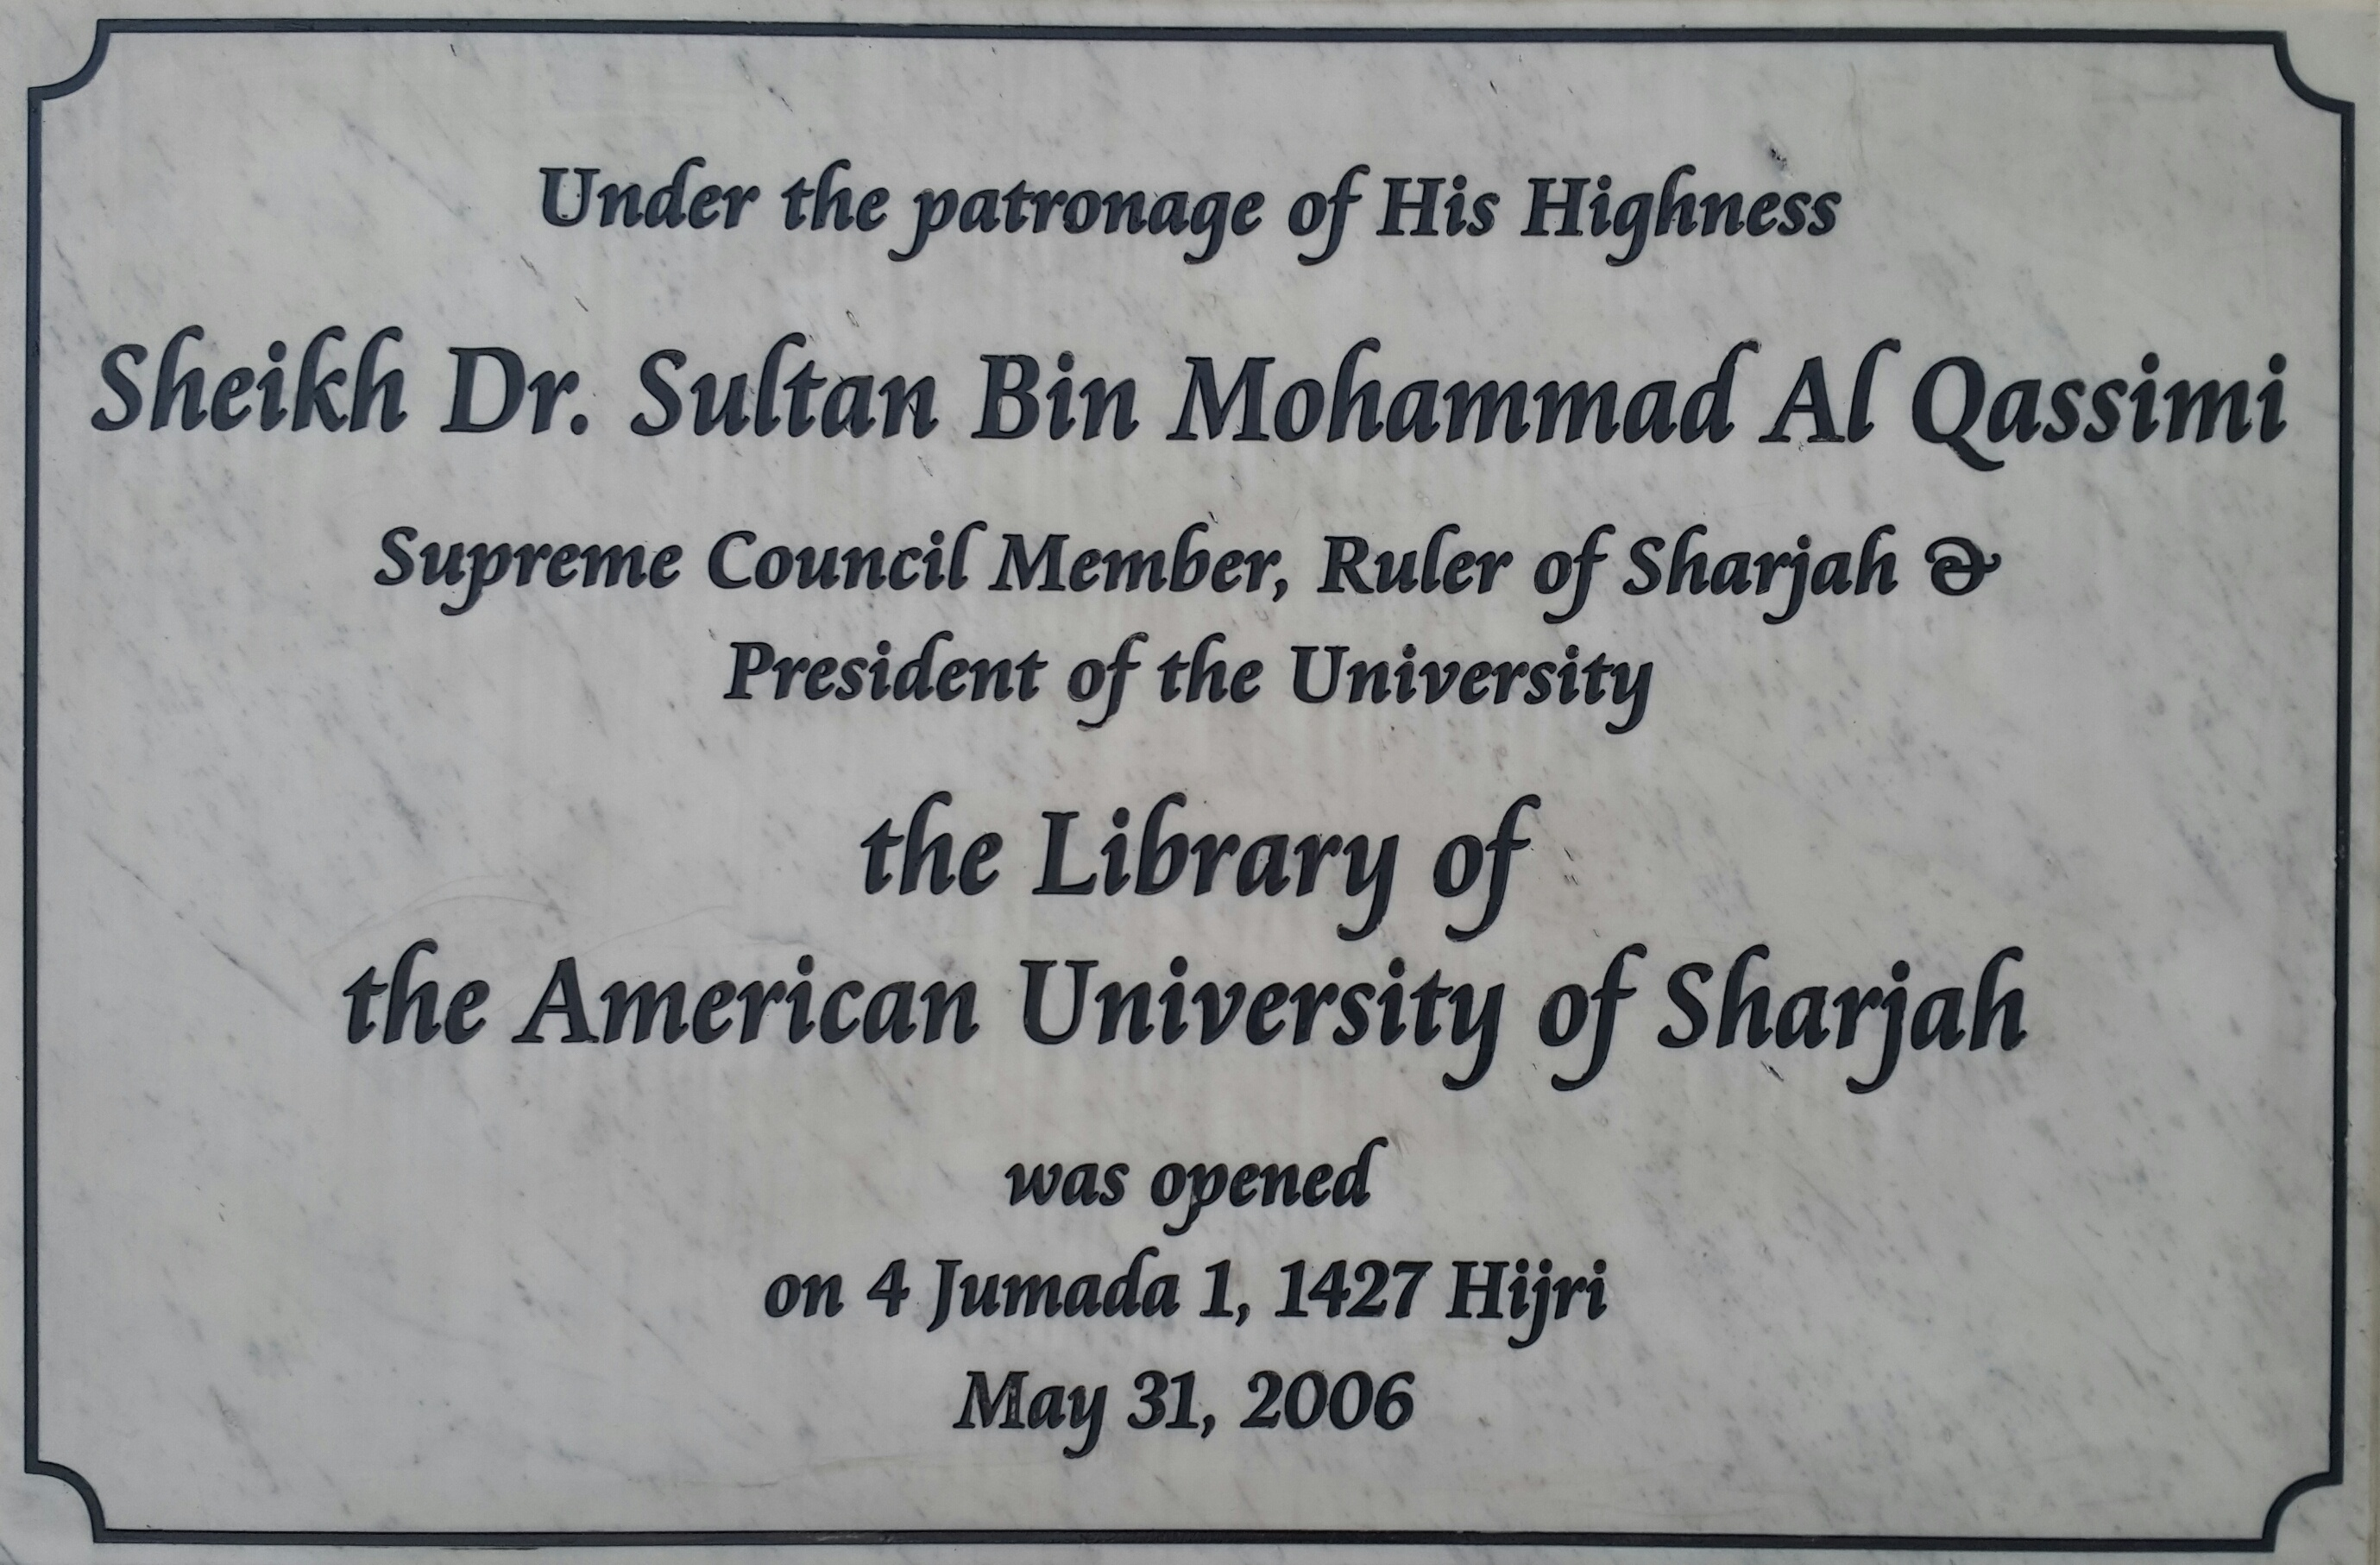 American_University_of_Sharjah_Library_1.jpg